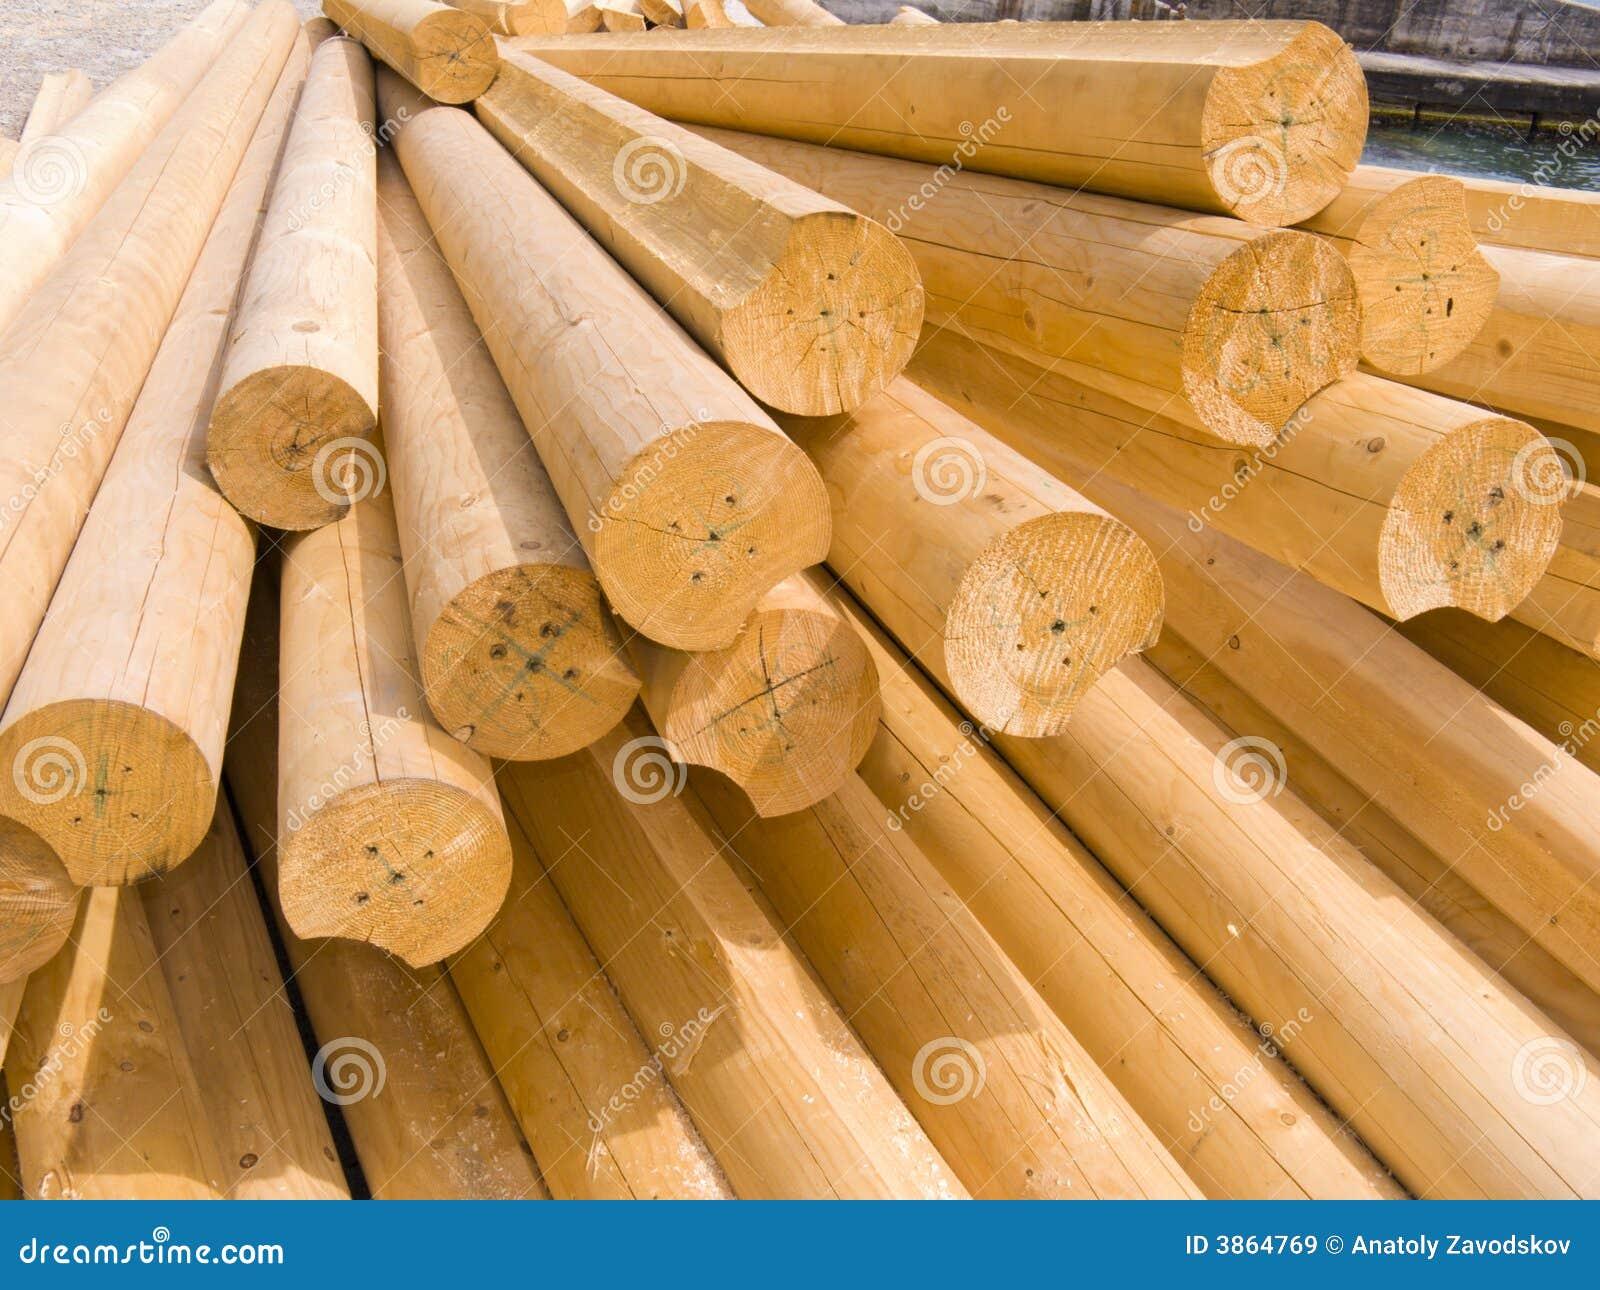 round-wooden-logs-3864769  X House Plans on dueplex floor plans, duplex home floor plans, 20x40 one-bedroom floor plans,